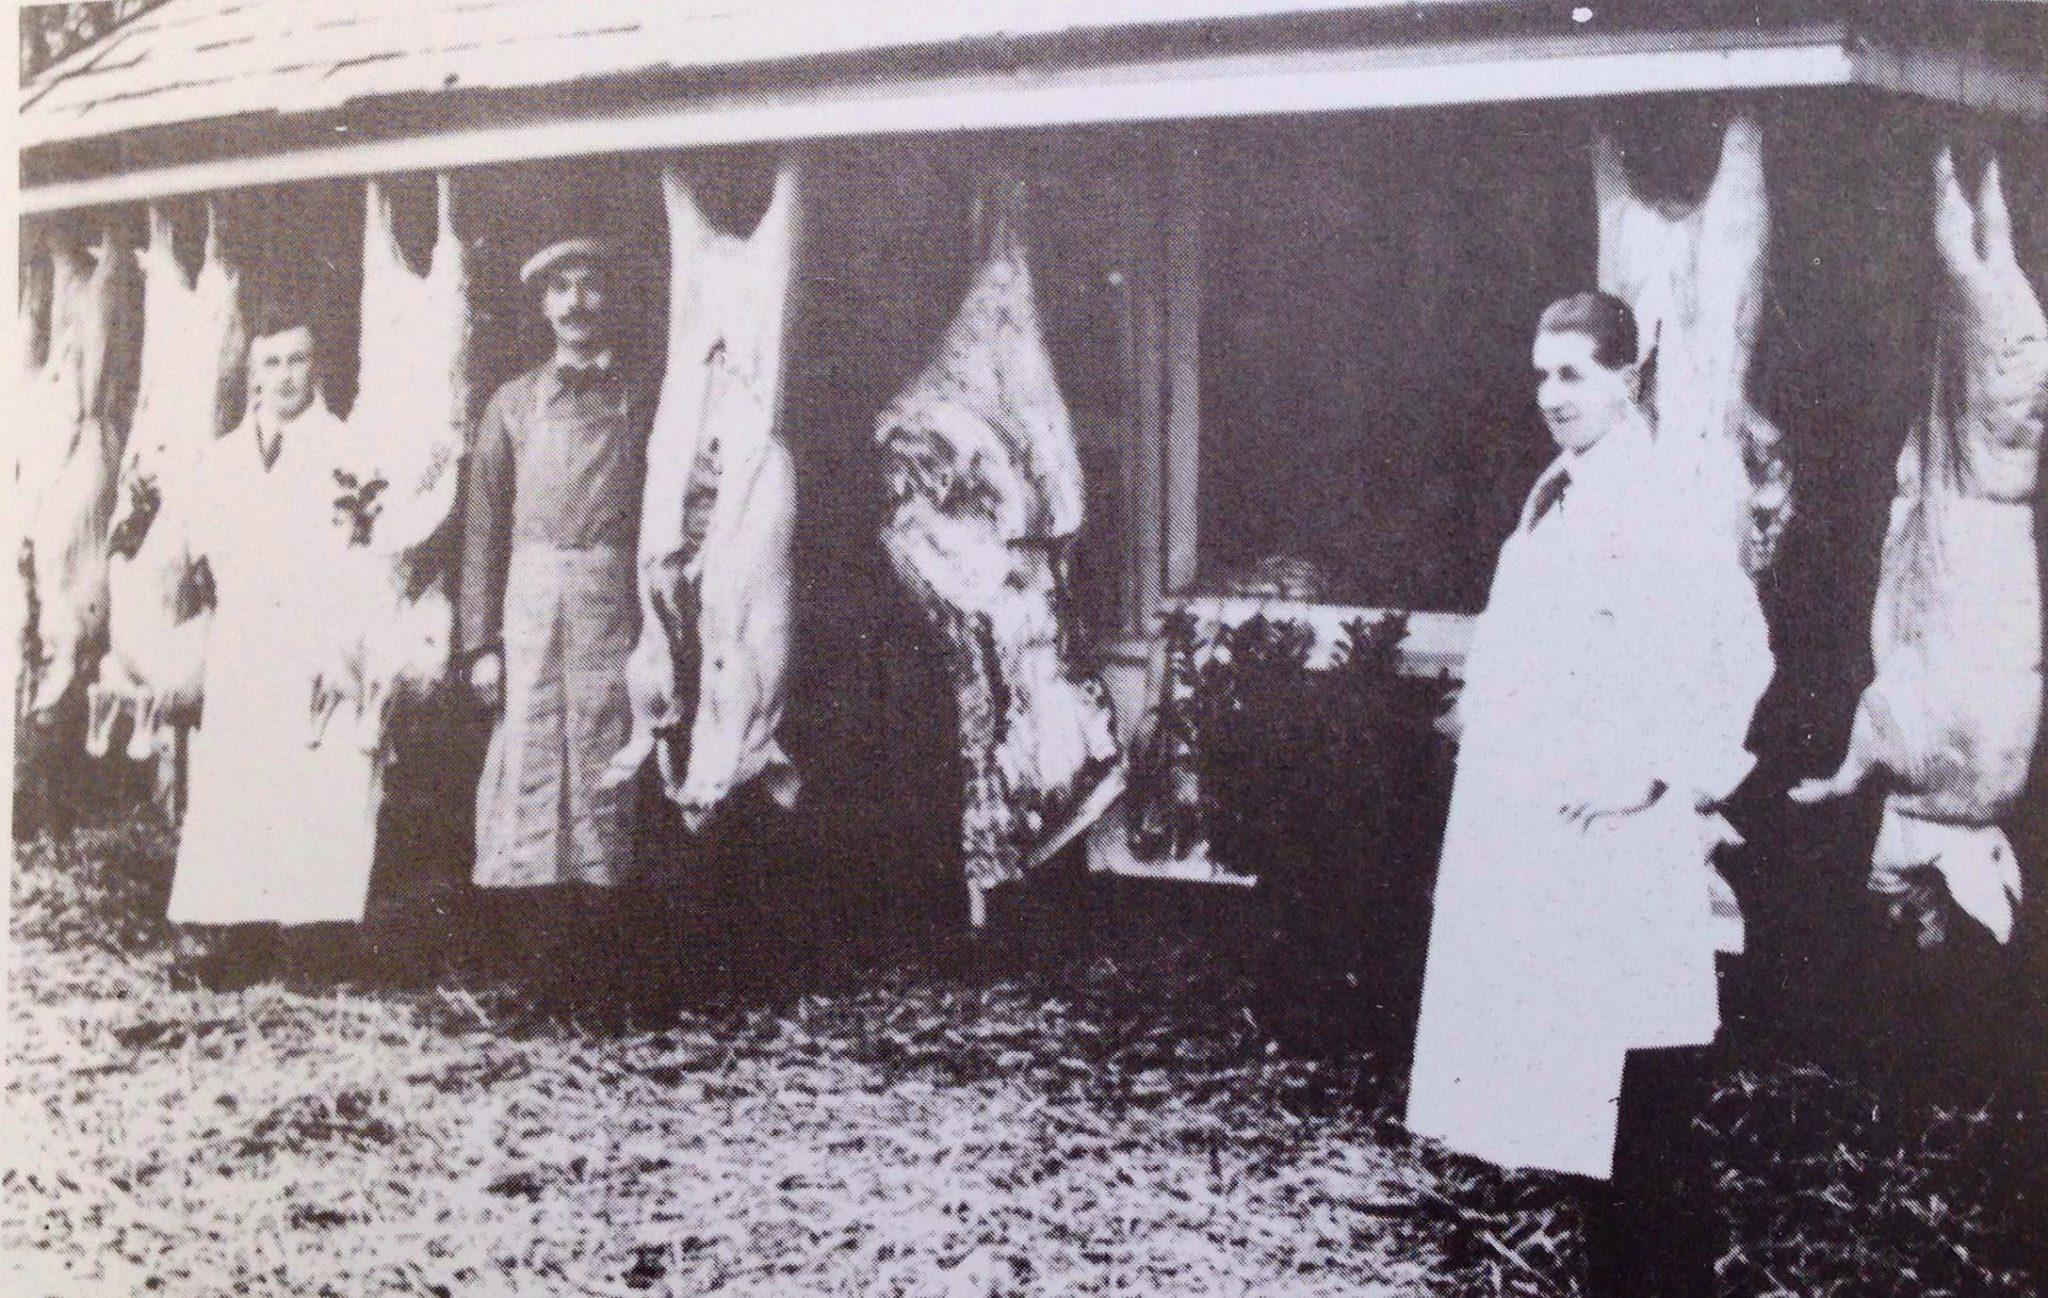 Pinchbeck Butchers